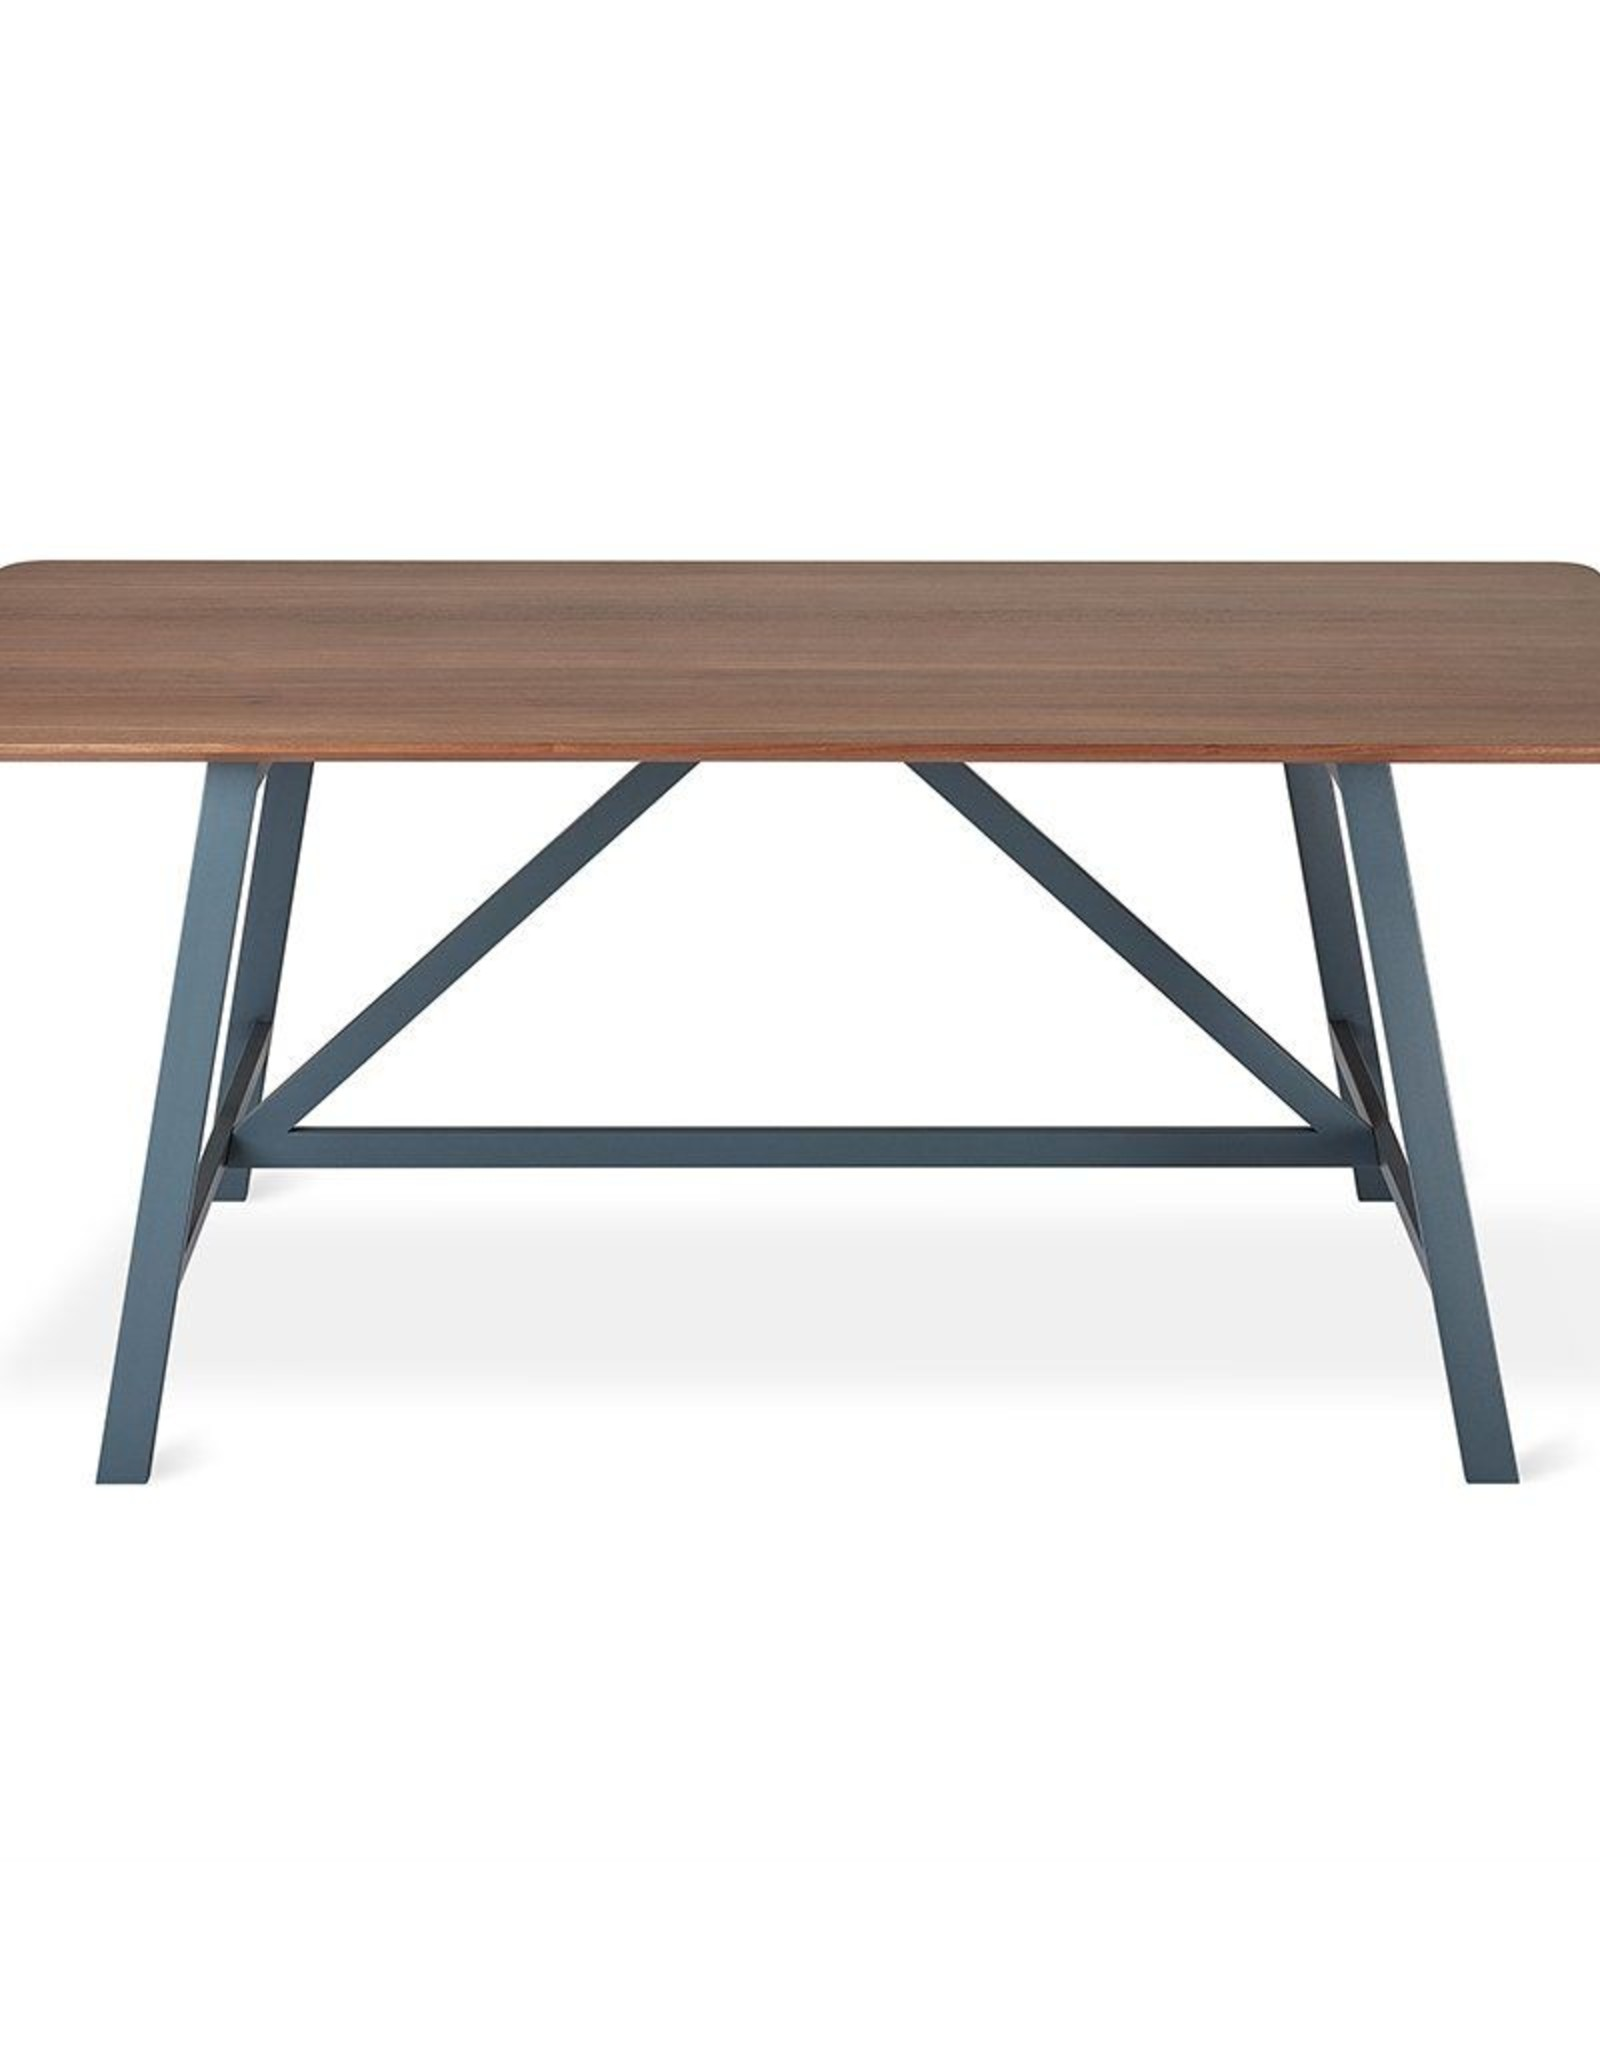 Gus* Modern Wychwood Dining Table